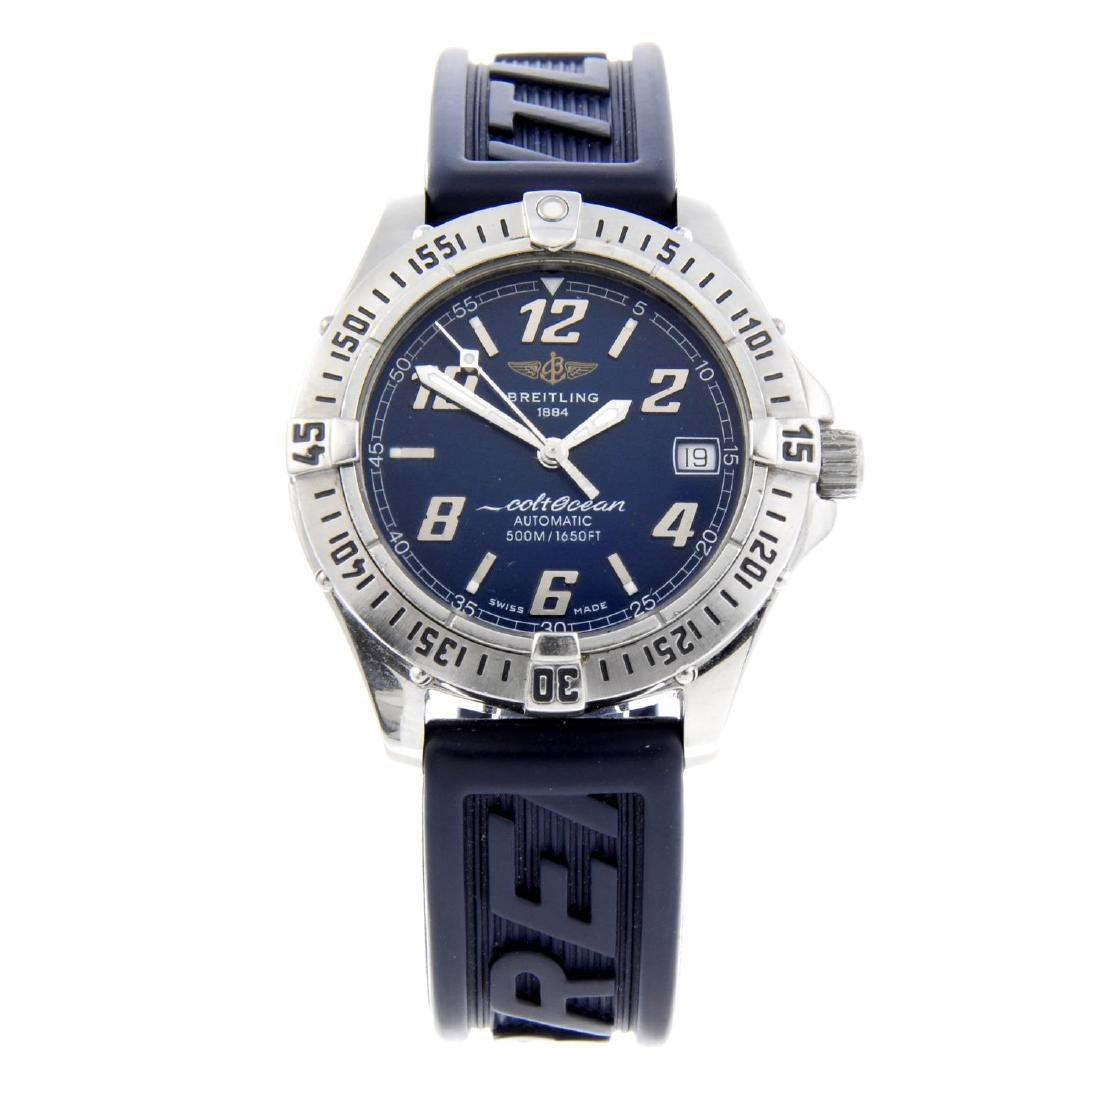 BREITLING - a gentleman's ColtOcean wrist watch.